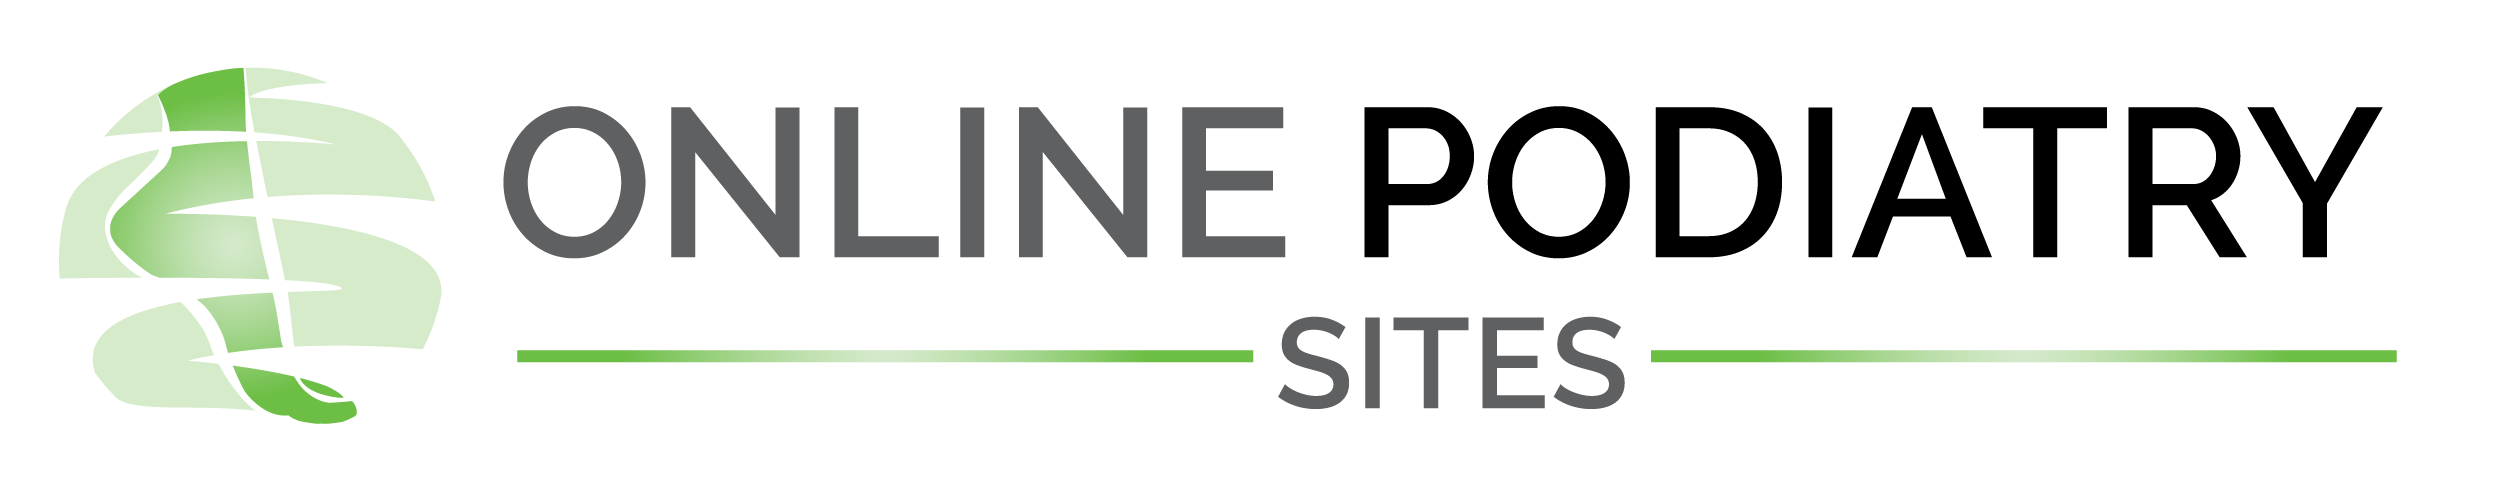 onlinepodiatrysites.com | Online Podiatry Sites